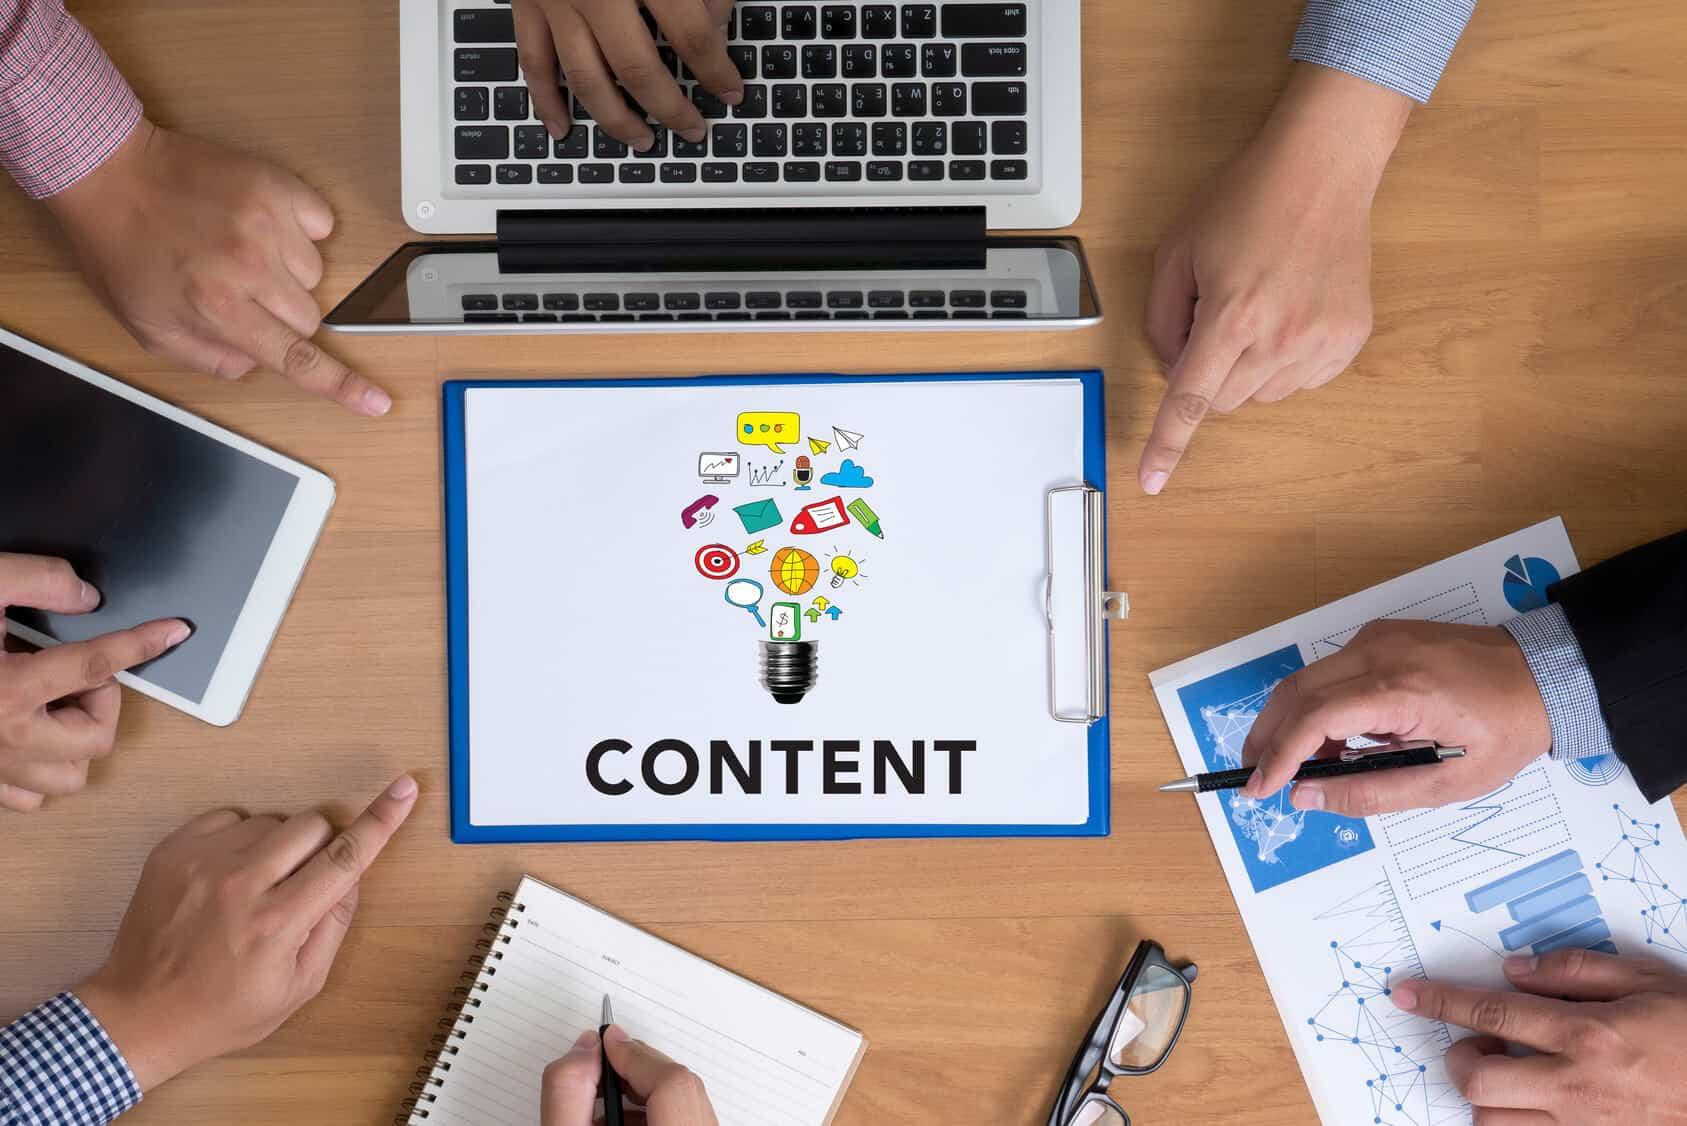 Warum Content-Marketing? © Fotolia 2016/ adiruch na chiangmai